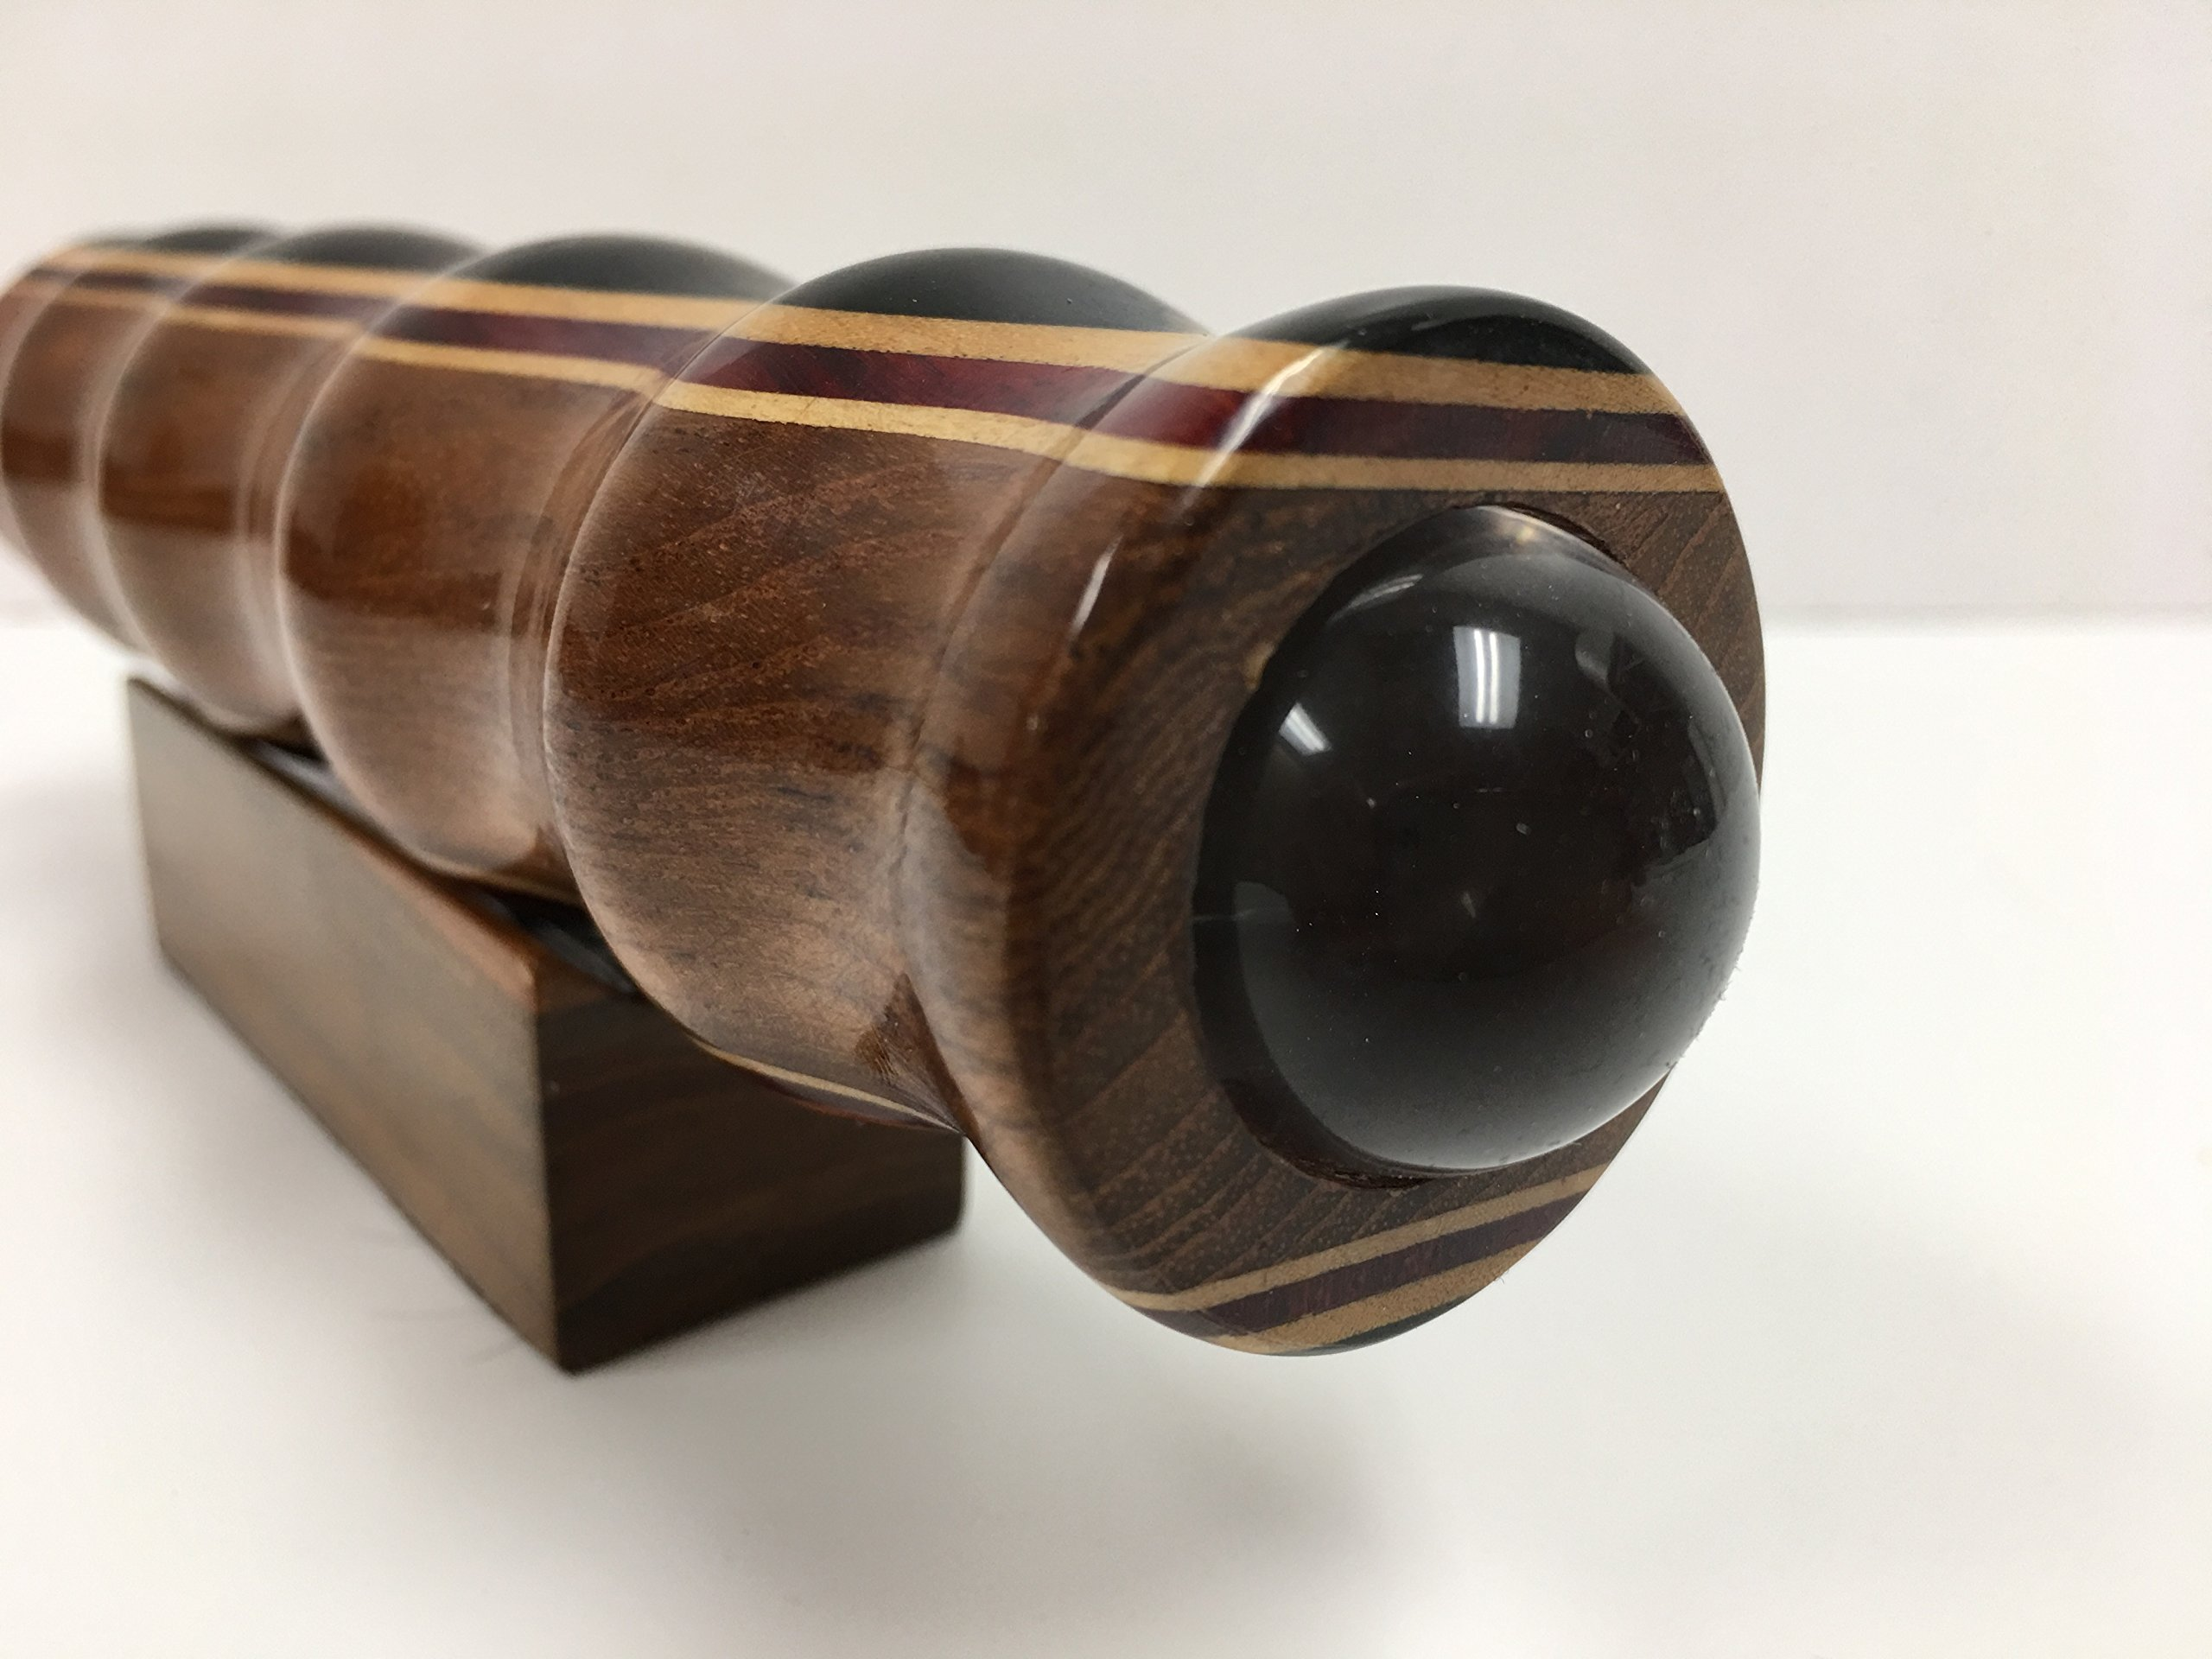 N & J Kaleidoscope Teleidoscope in Teak, 7 Inch Barrel, Laminated Solid Woods Including Padauk, Jalneem and Ebony by N & J (Image #2)